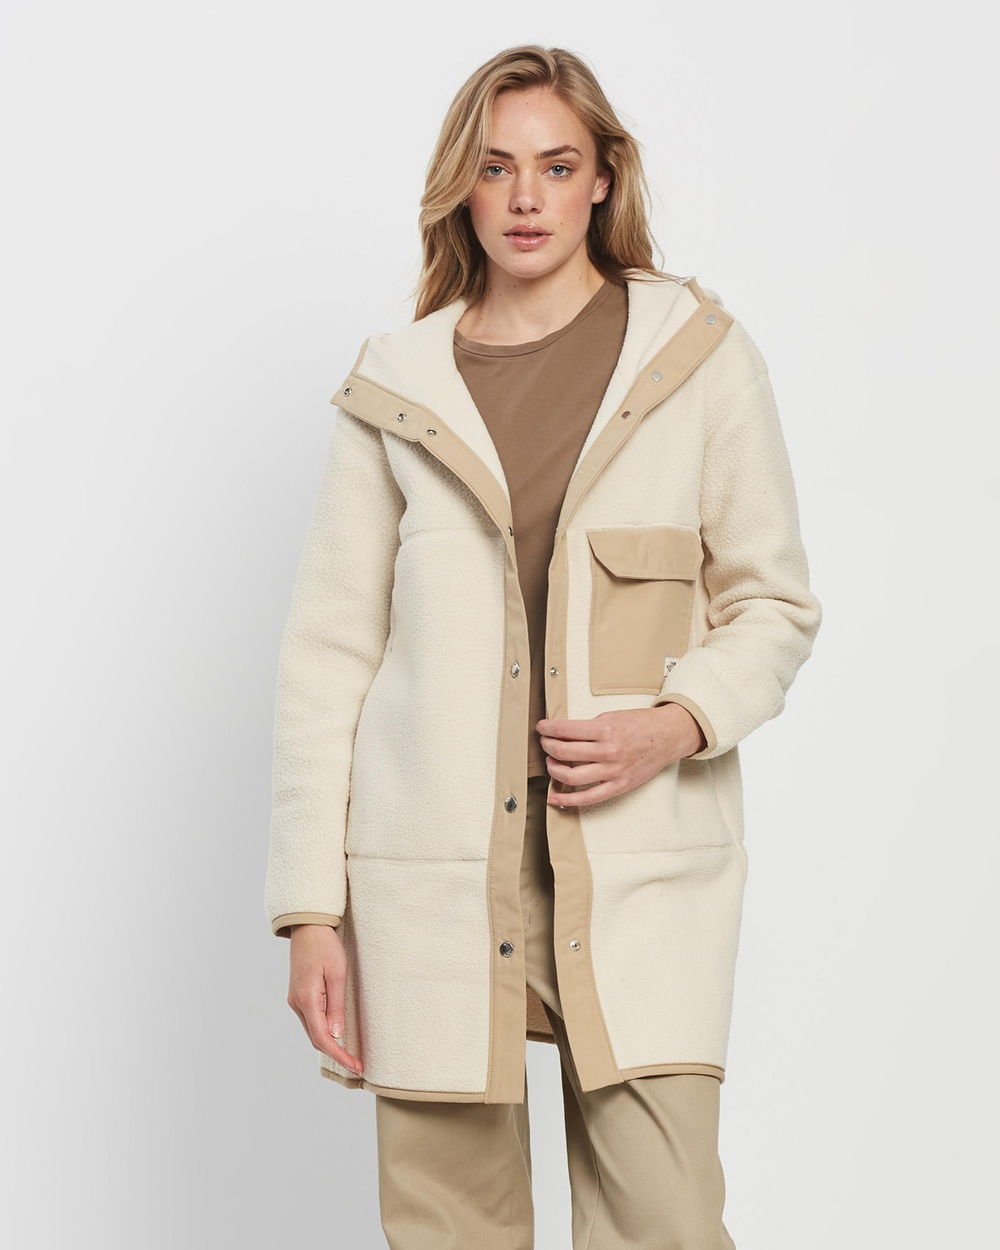 The North Face Cragmont Fleece Coat Coats & Jackets Bleached Sand Hawthorne Khaki